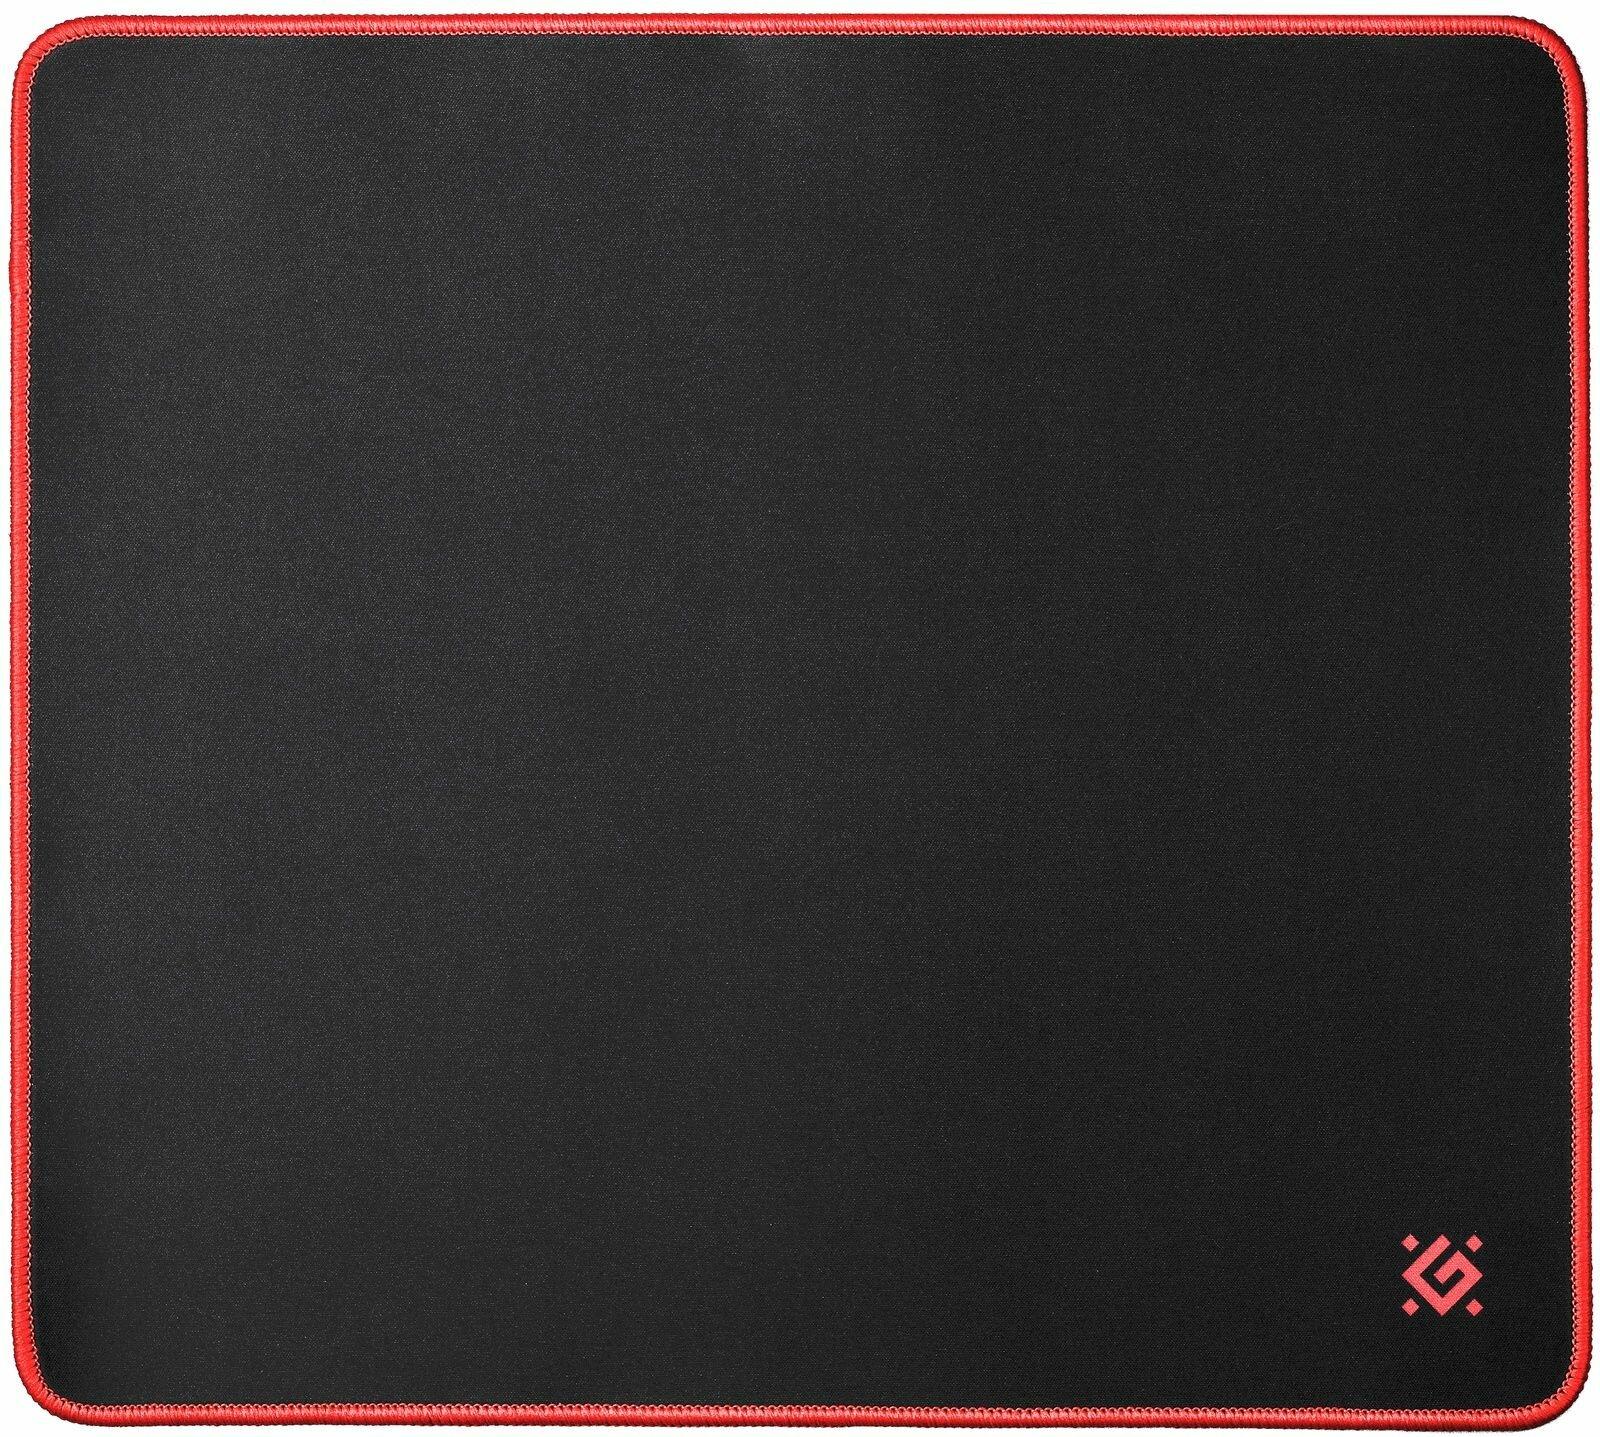 Игровой коврик Defender Black XXL 400x355x3 мм, ткань+резина